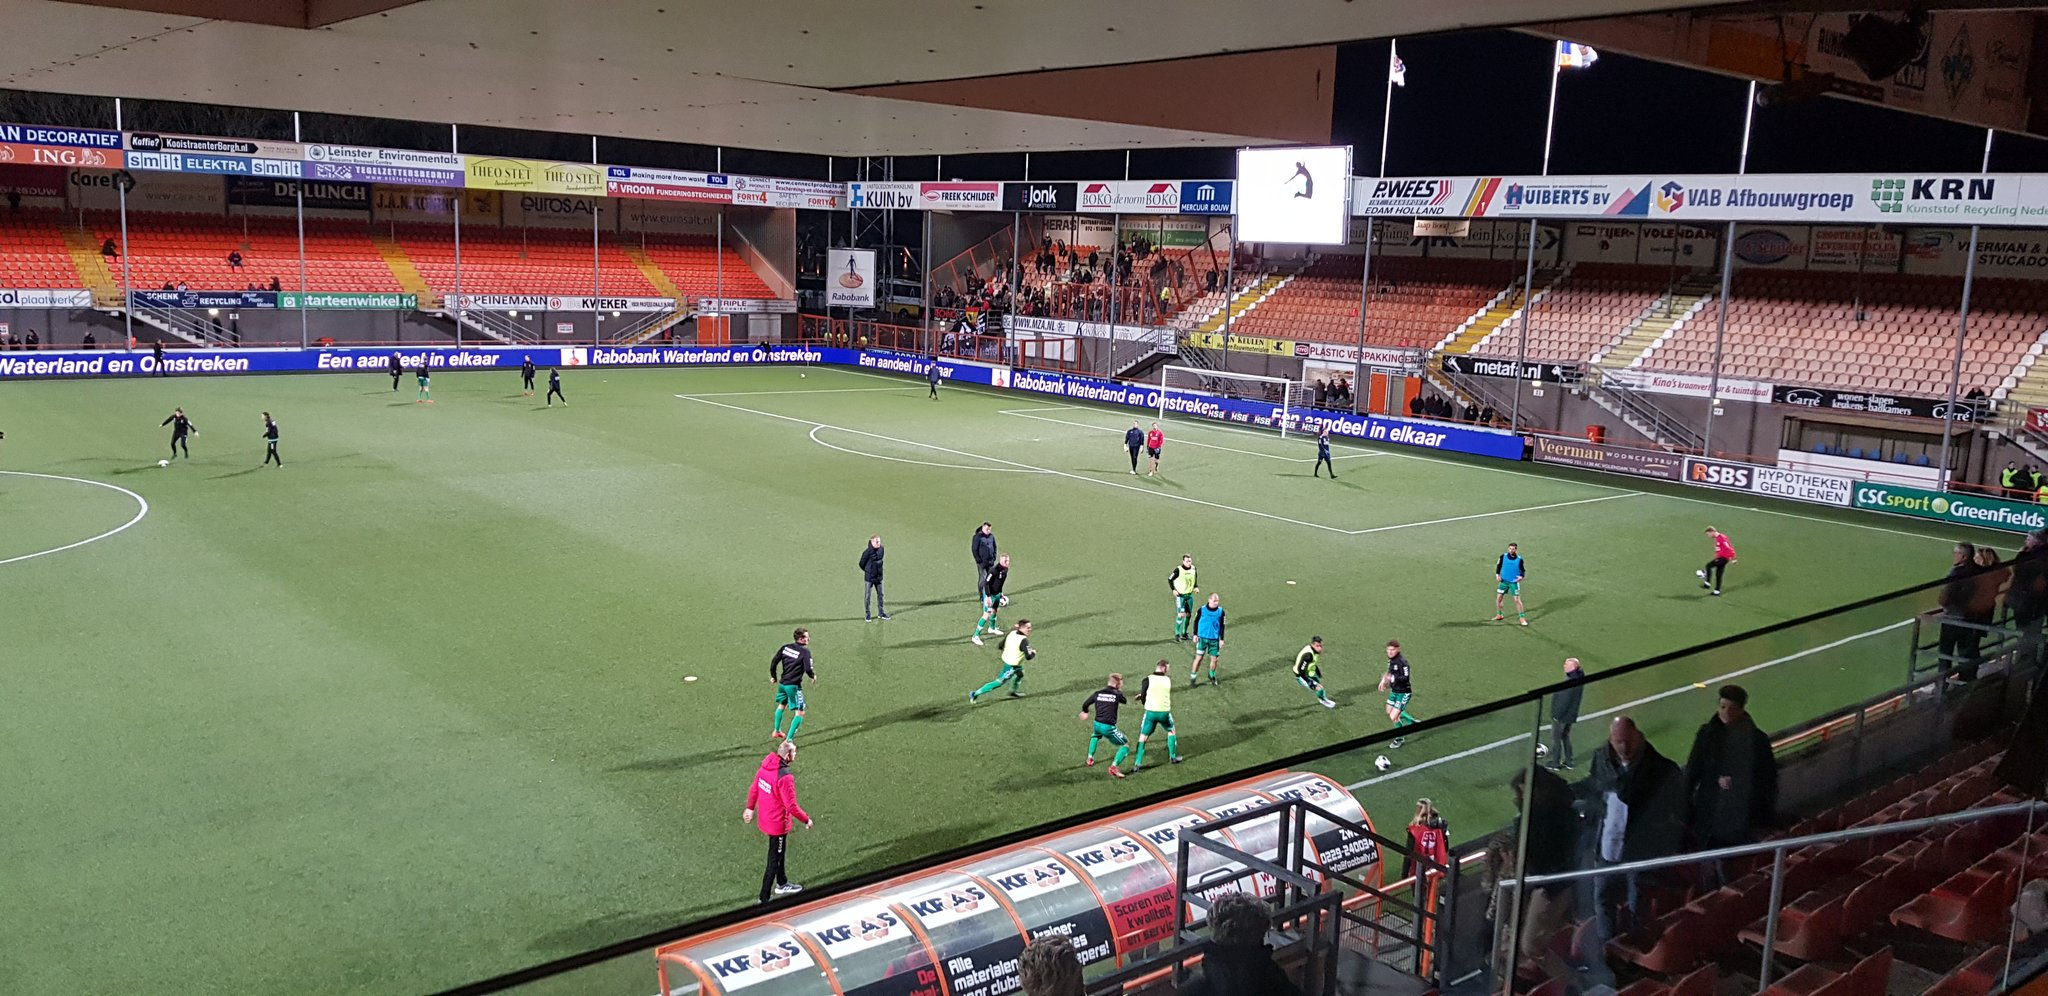 Leeg stadion FC Volendam